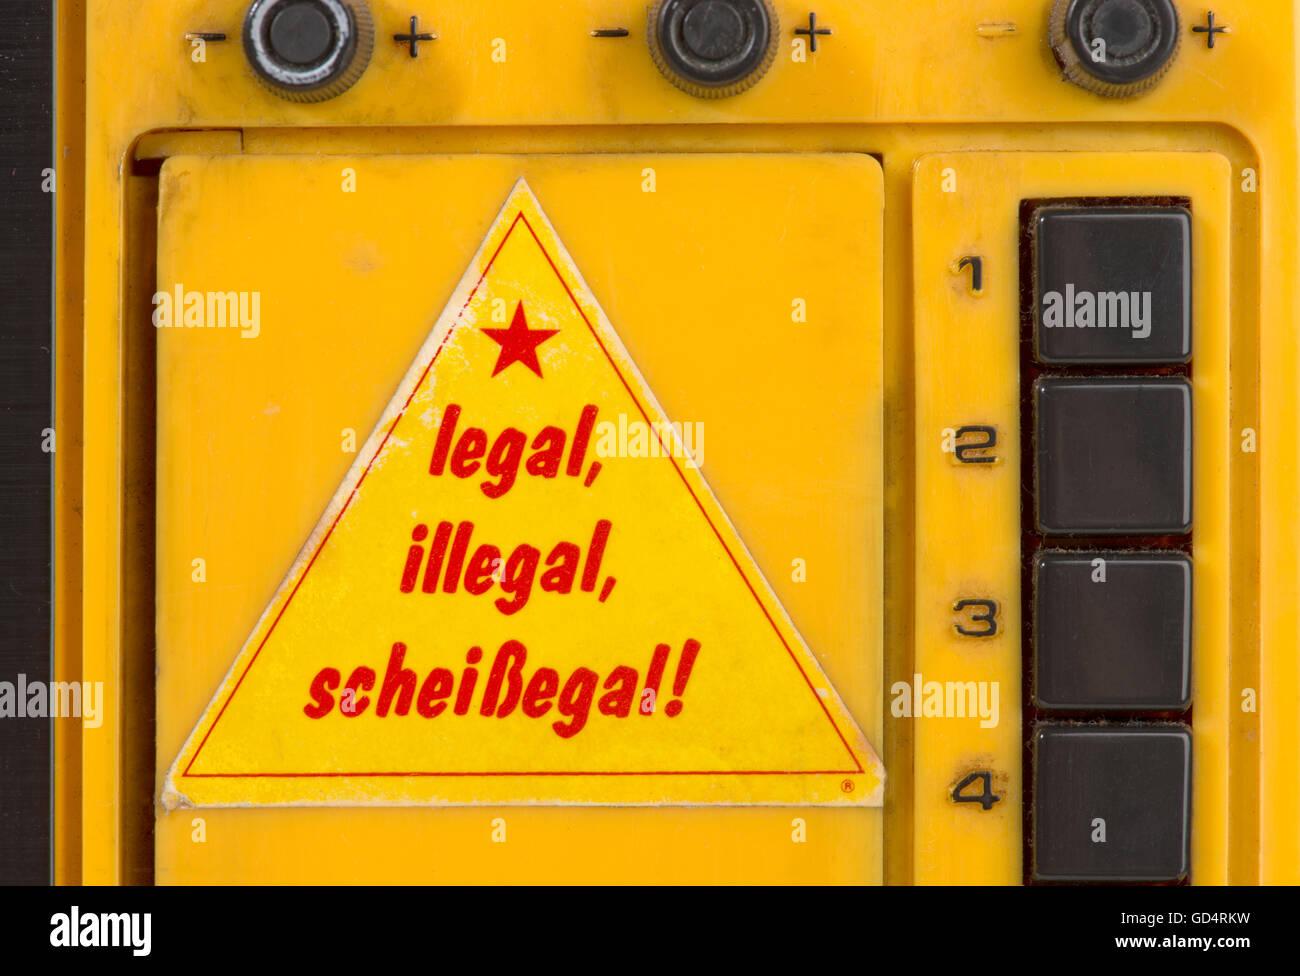 literature, aphorism, 'Legal, illegal, scheissegal!' (Legal, illegal, all bullshit), sticker on television - Stock Image